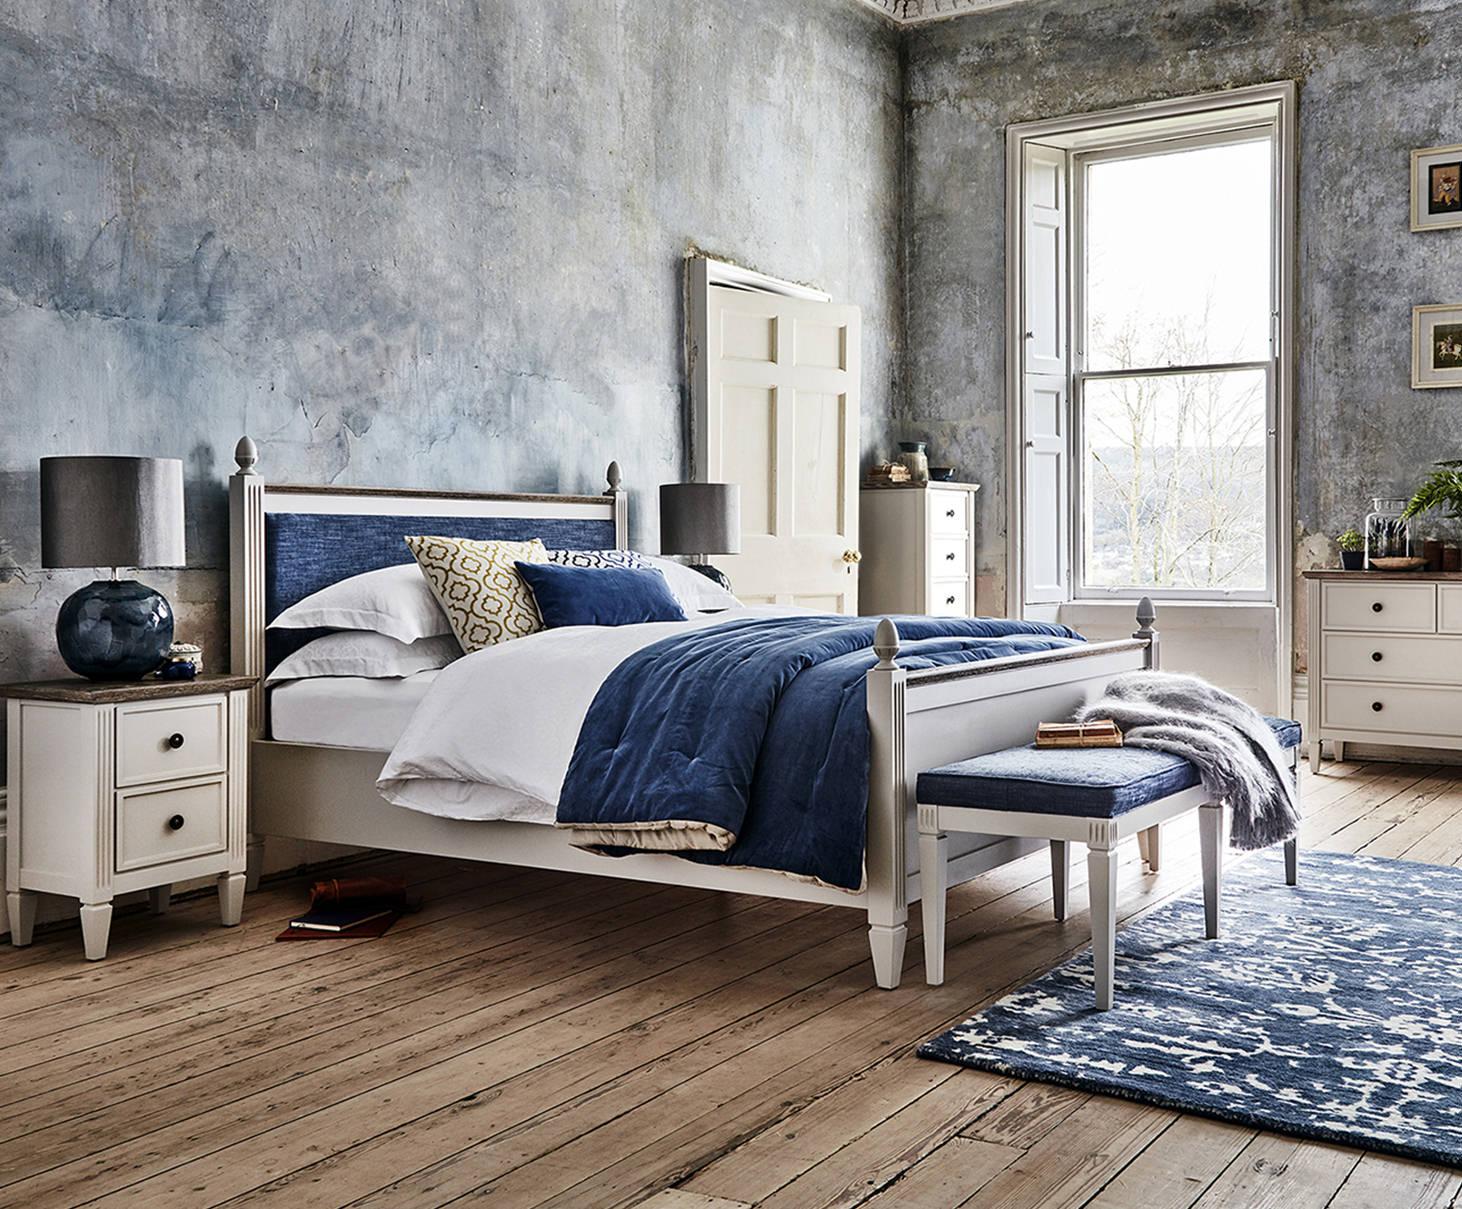 feather-black-verona-bedroom-collection.jpg